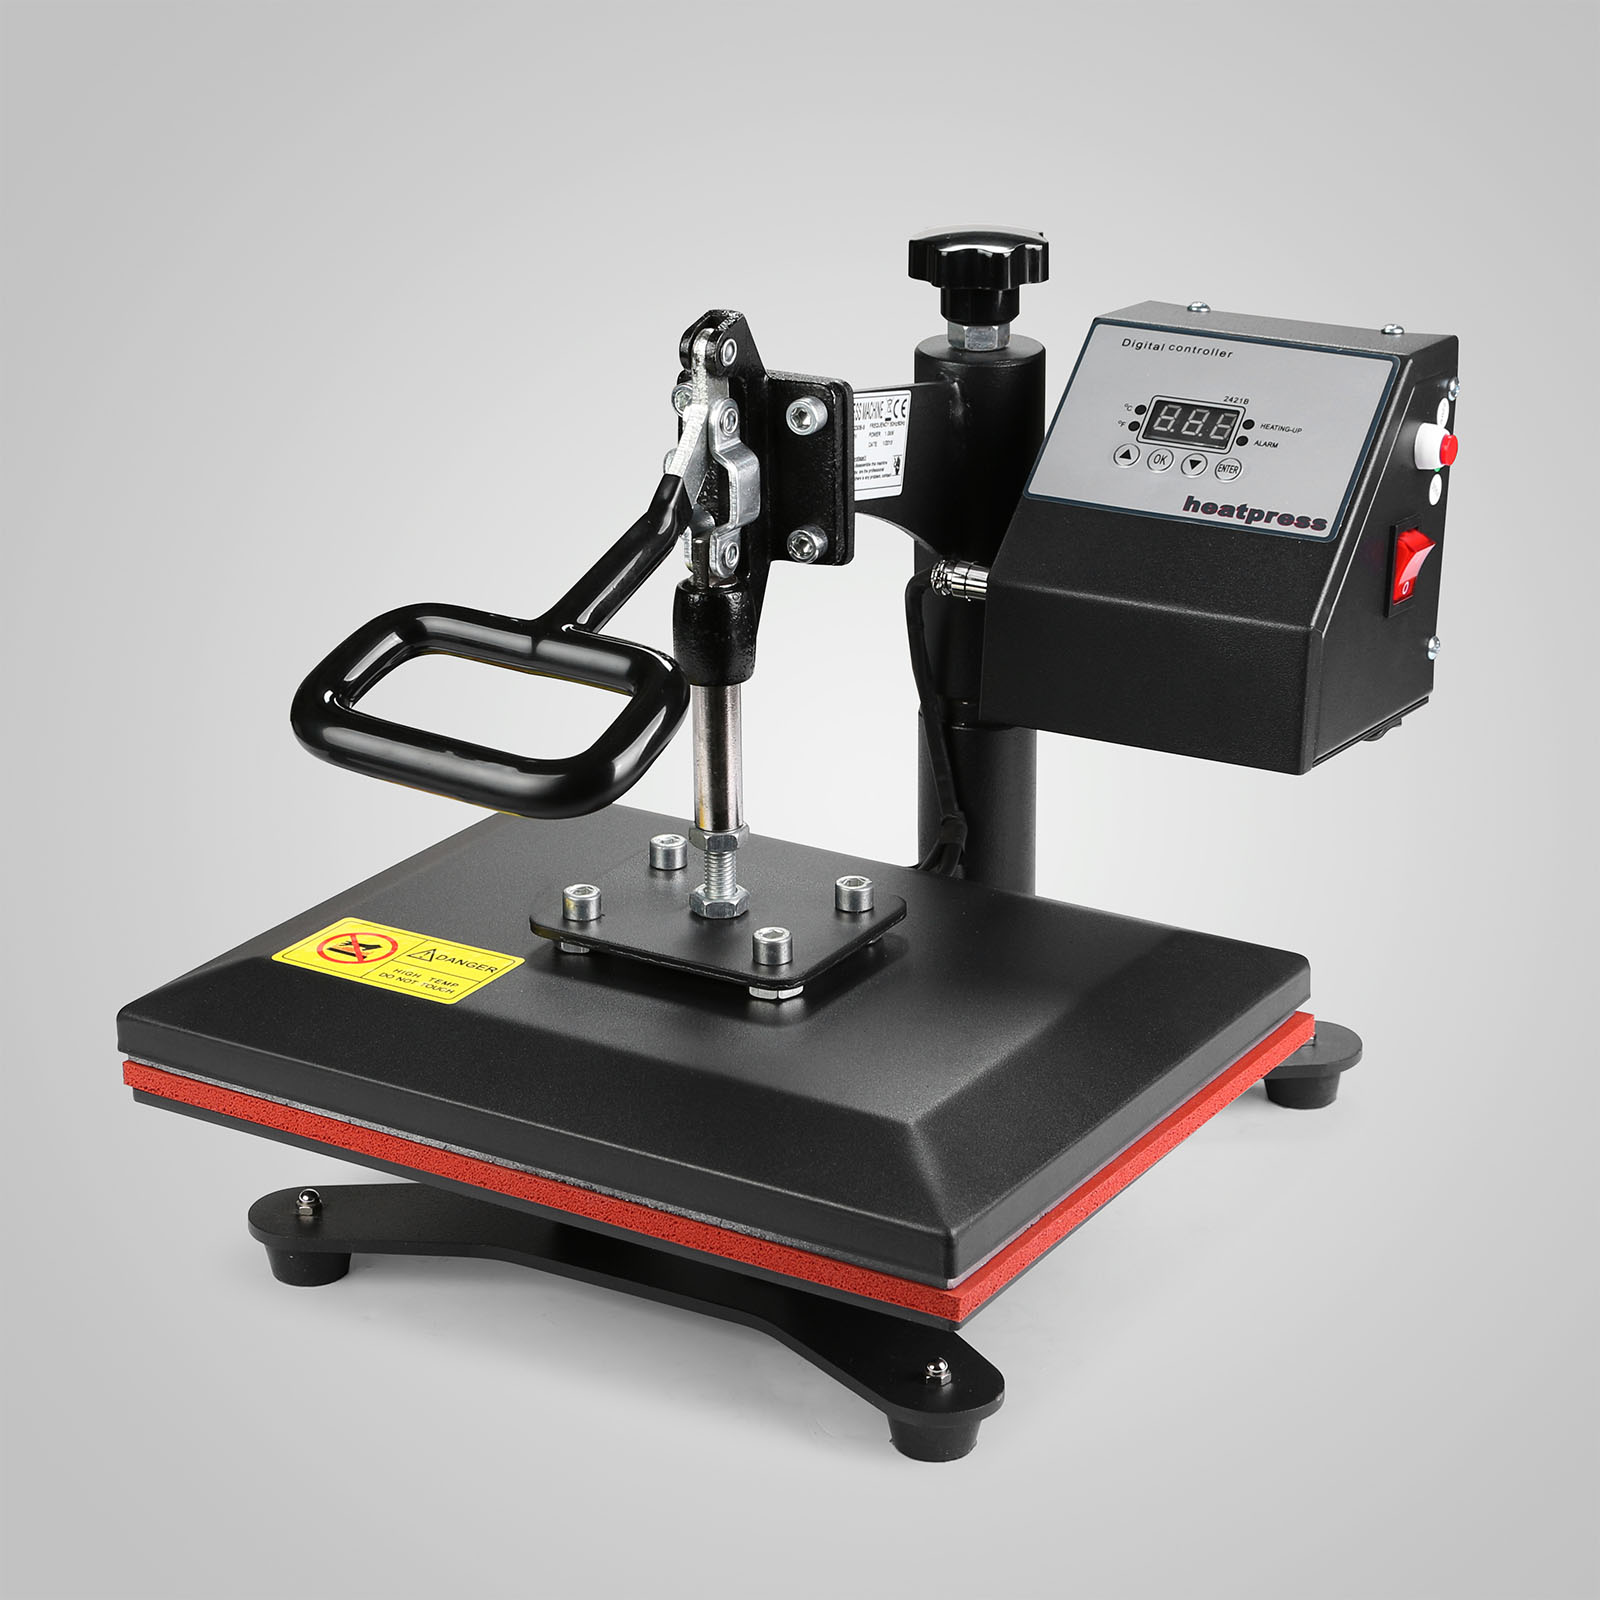 12x10 presse chaud transfert t shirt machine 0 399 c. Black Bedroom Furniture Sets. Home Design Ideas